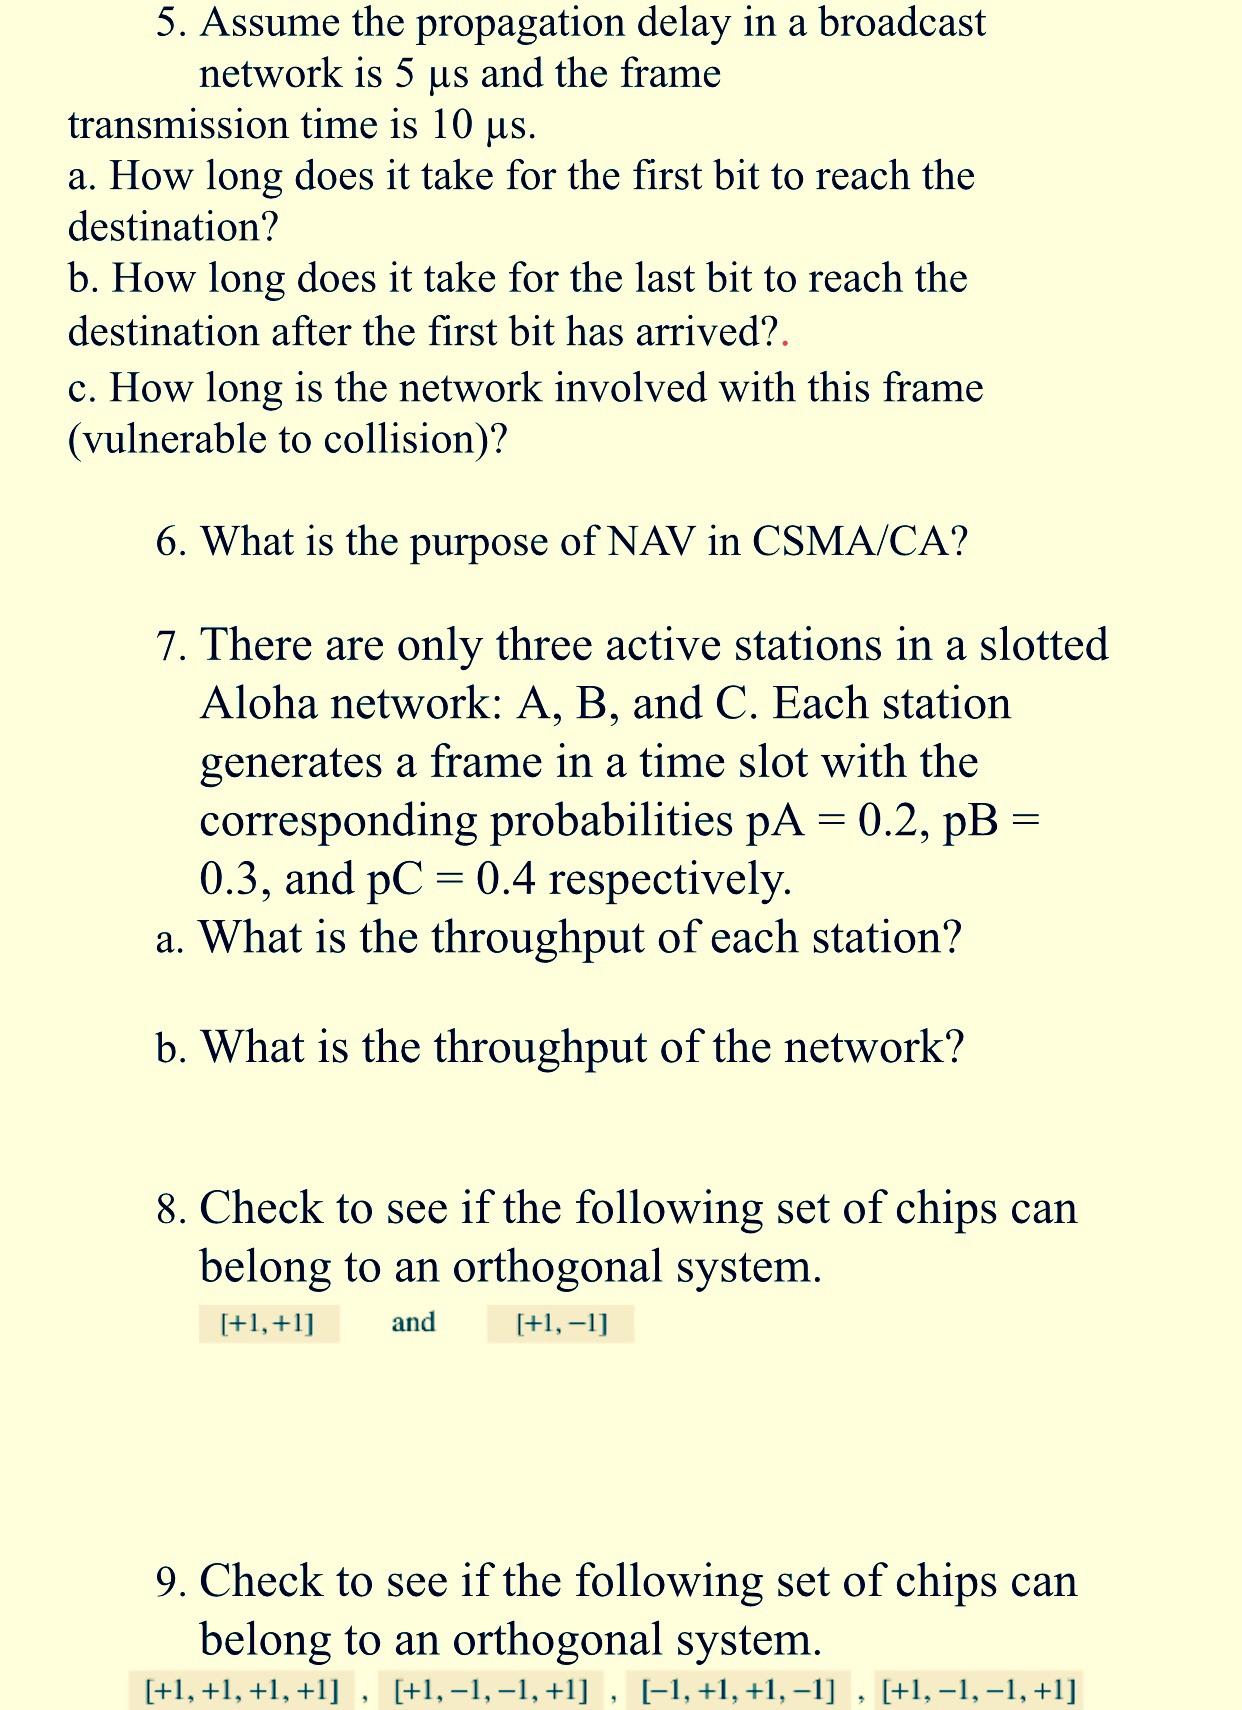 5. Assume The Propagation Delay In A Broadcast Net... | Chegg.com